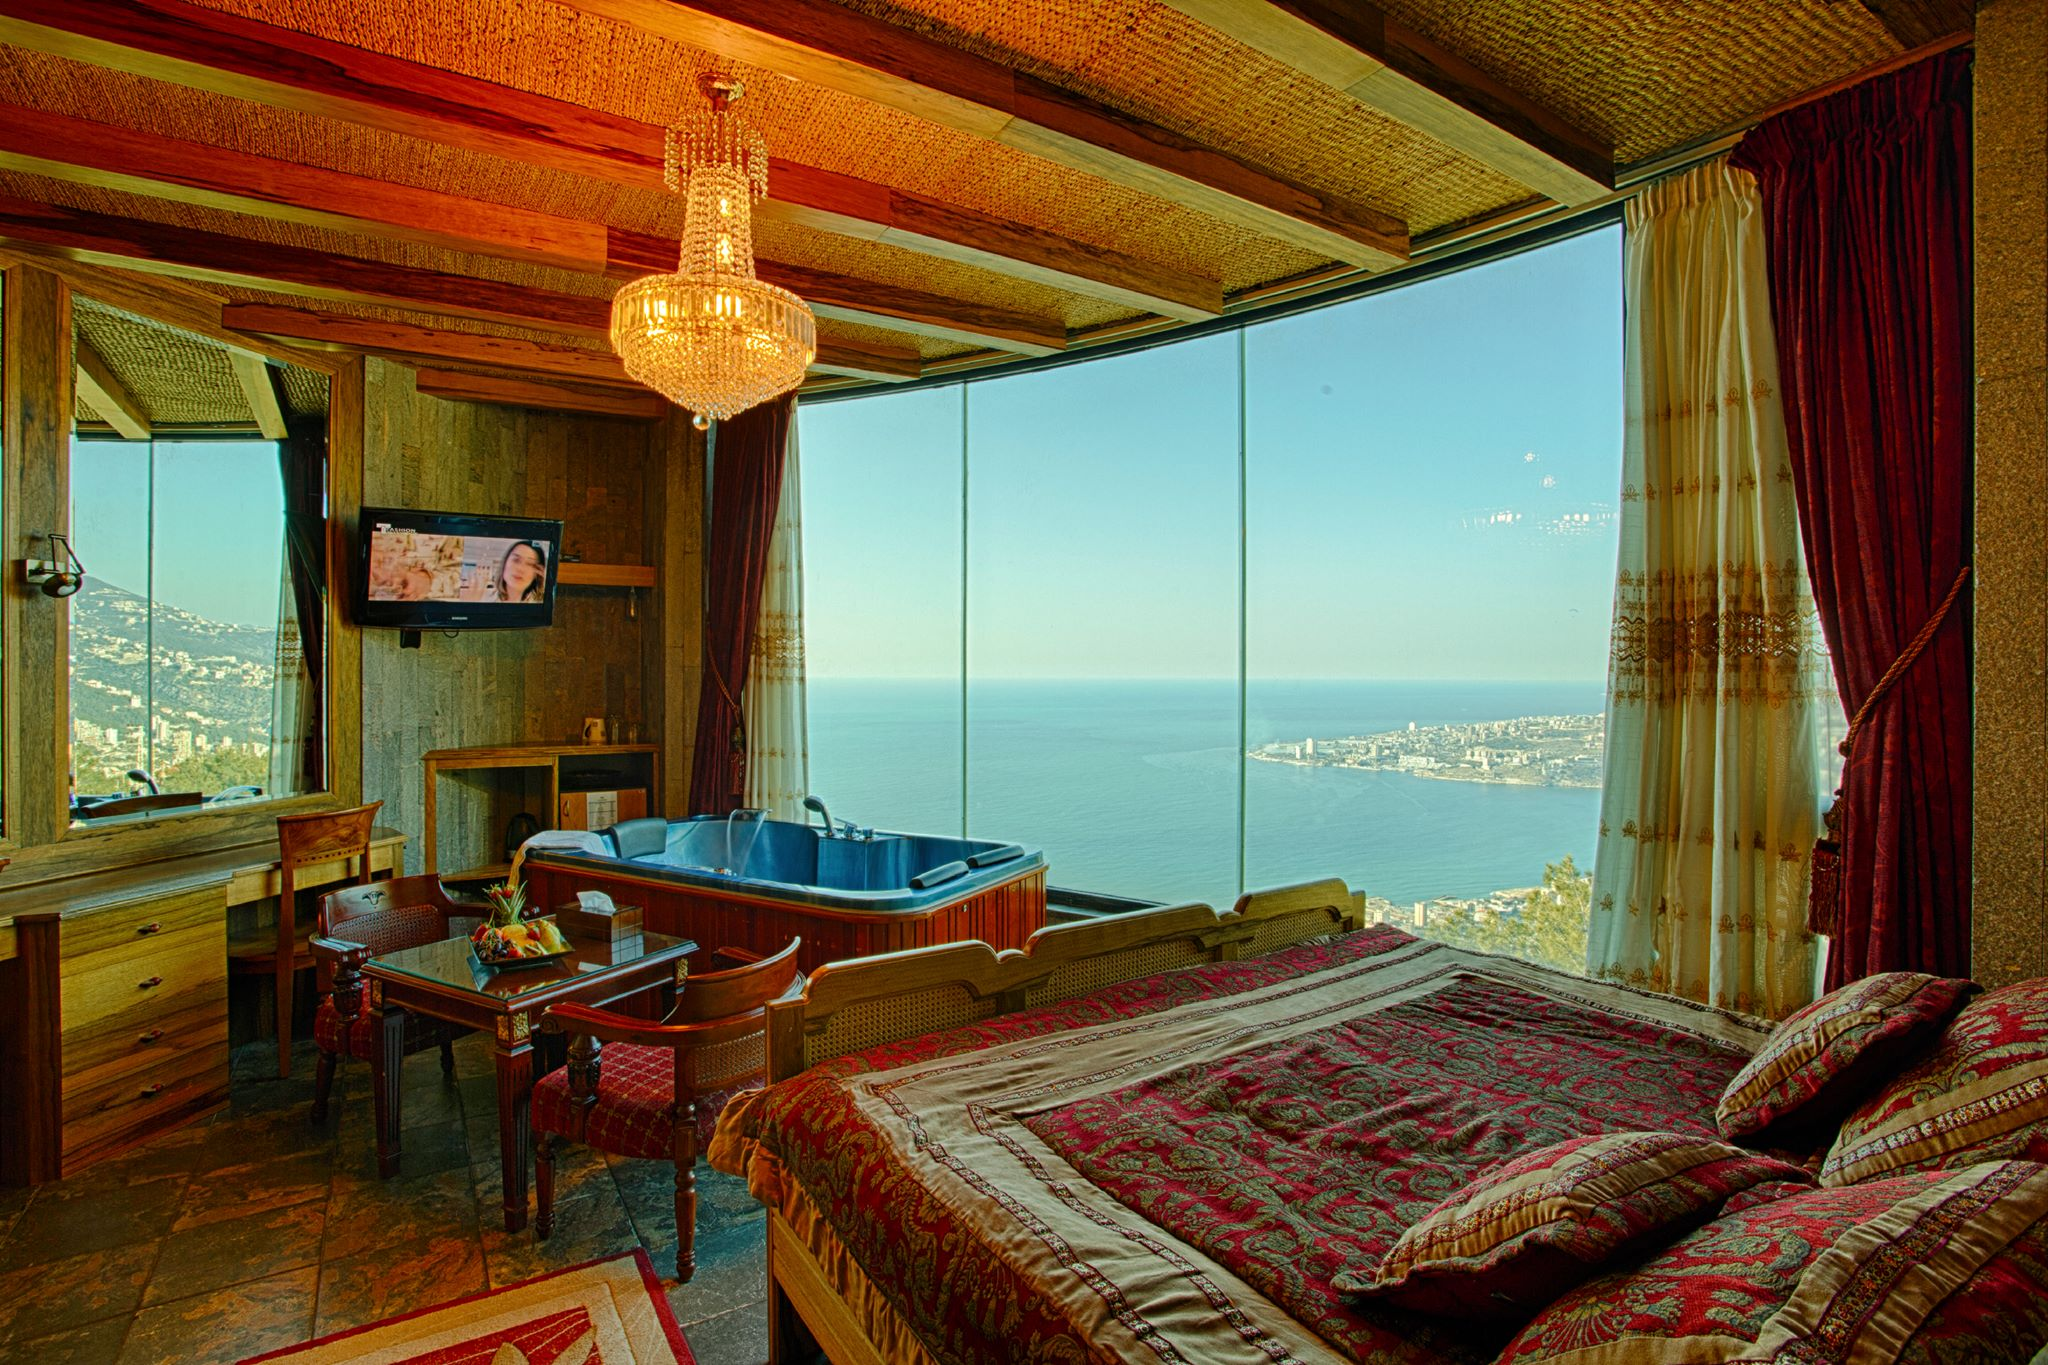 Bay Lodge Boutique Hotel Harissa Jounieh Lebanon  Home